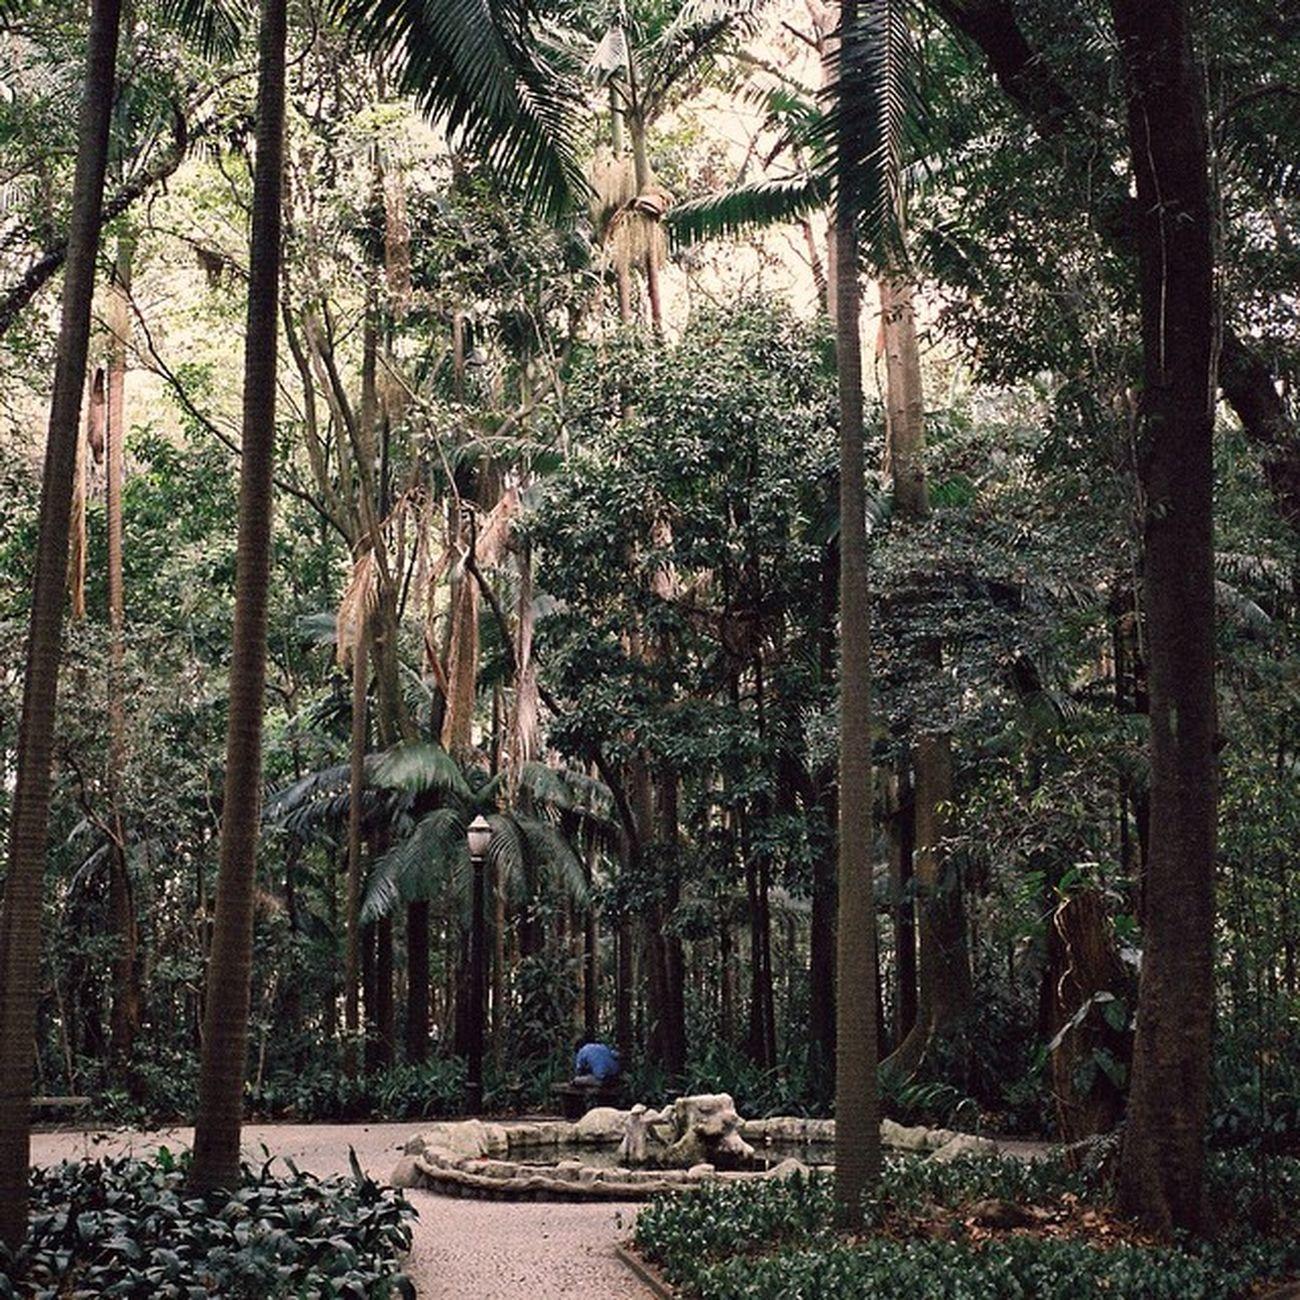 Brasil Brazil Saopaulo Paulista City Contax Cymera Cymeraapp Vscocam VSCO People Park